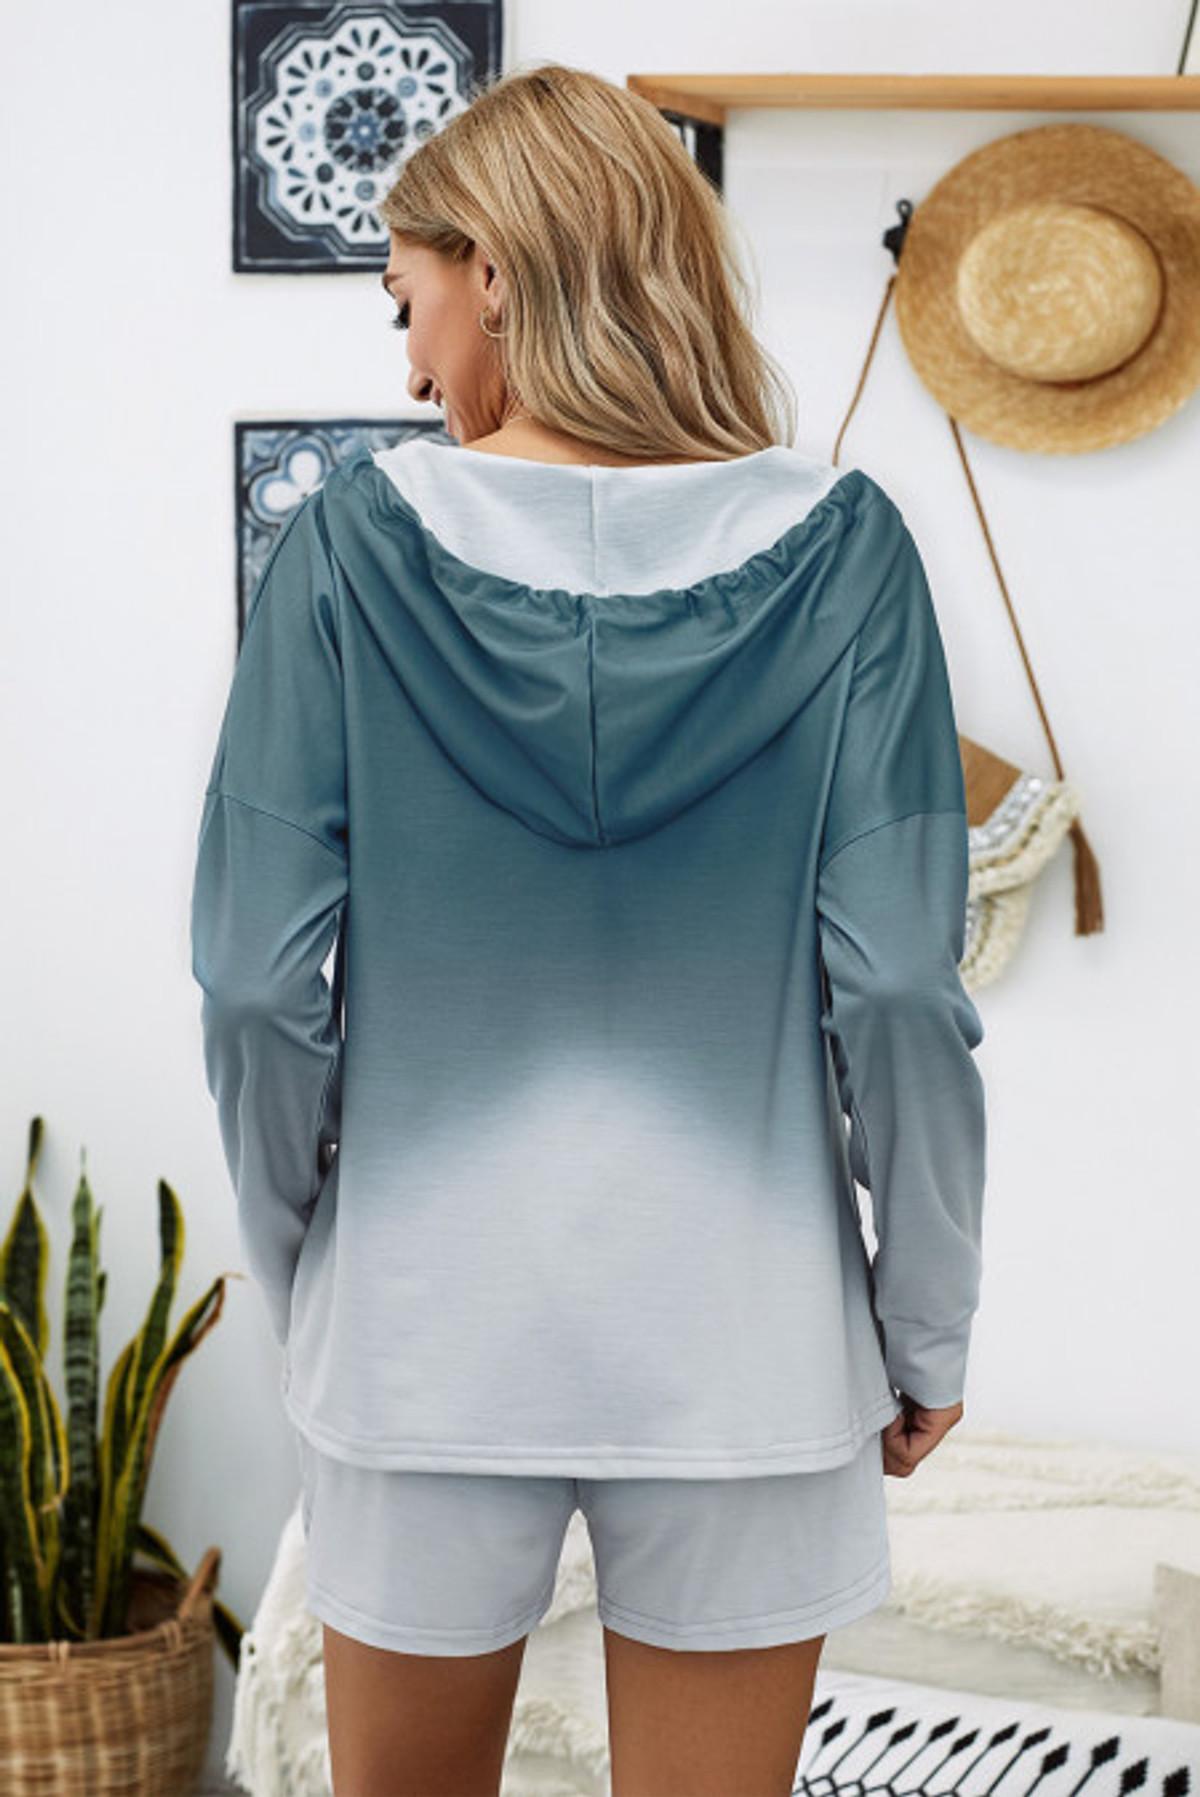 Ombre Hooded Lounge Sweatshirt & Shorts Set (FRE45068-5)  FRE450685F2XL